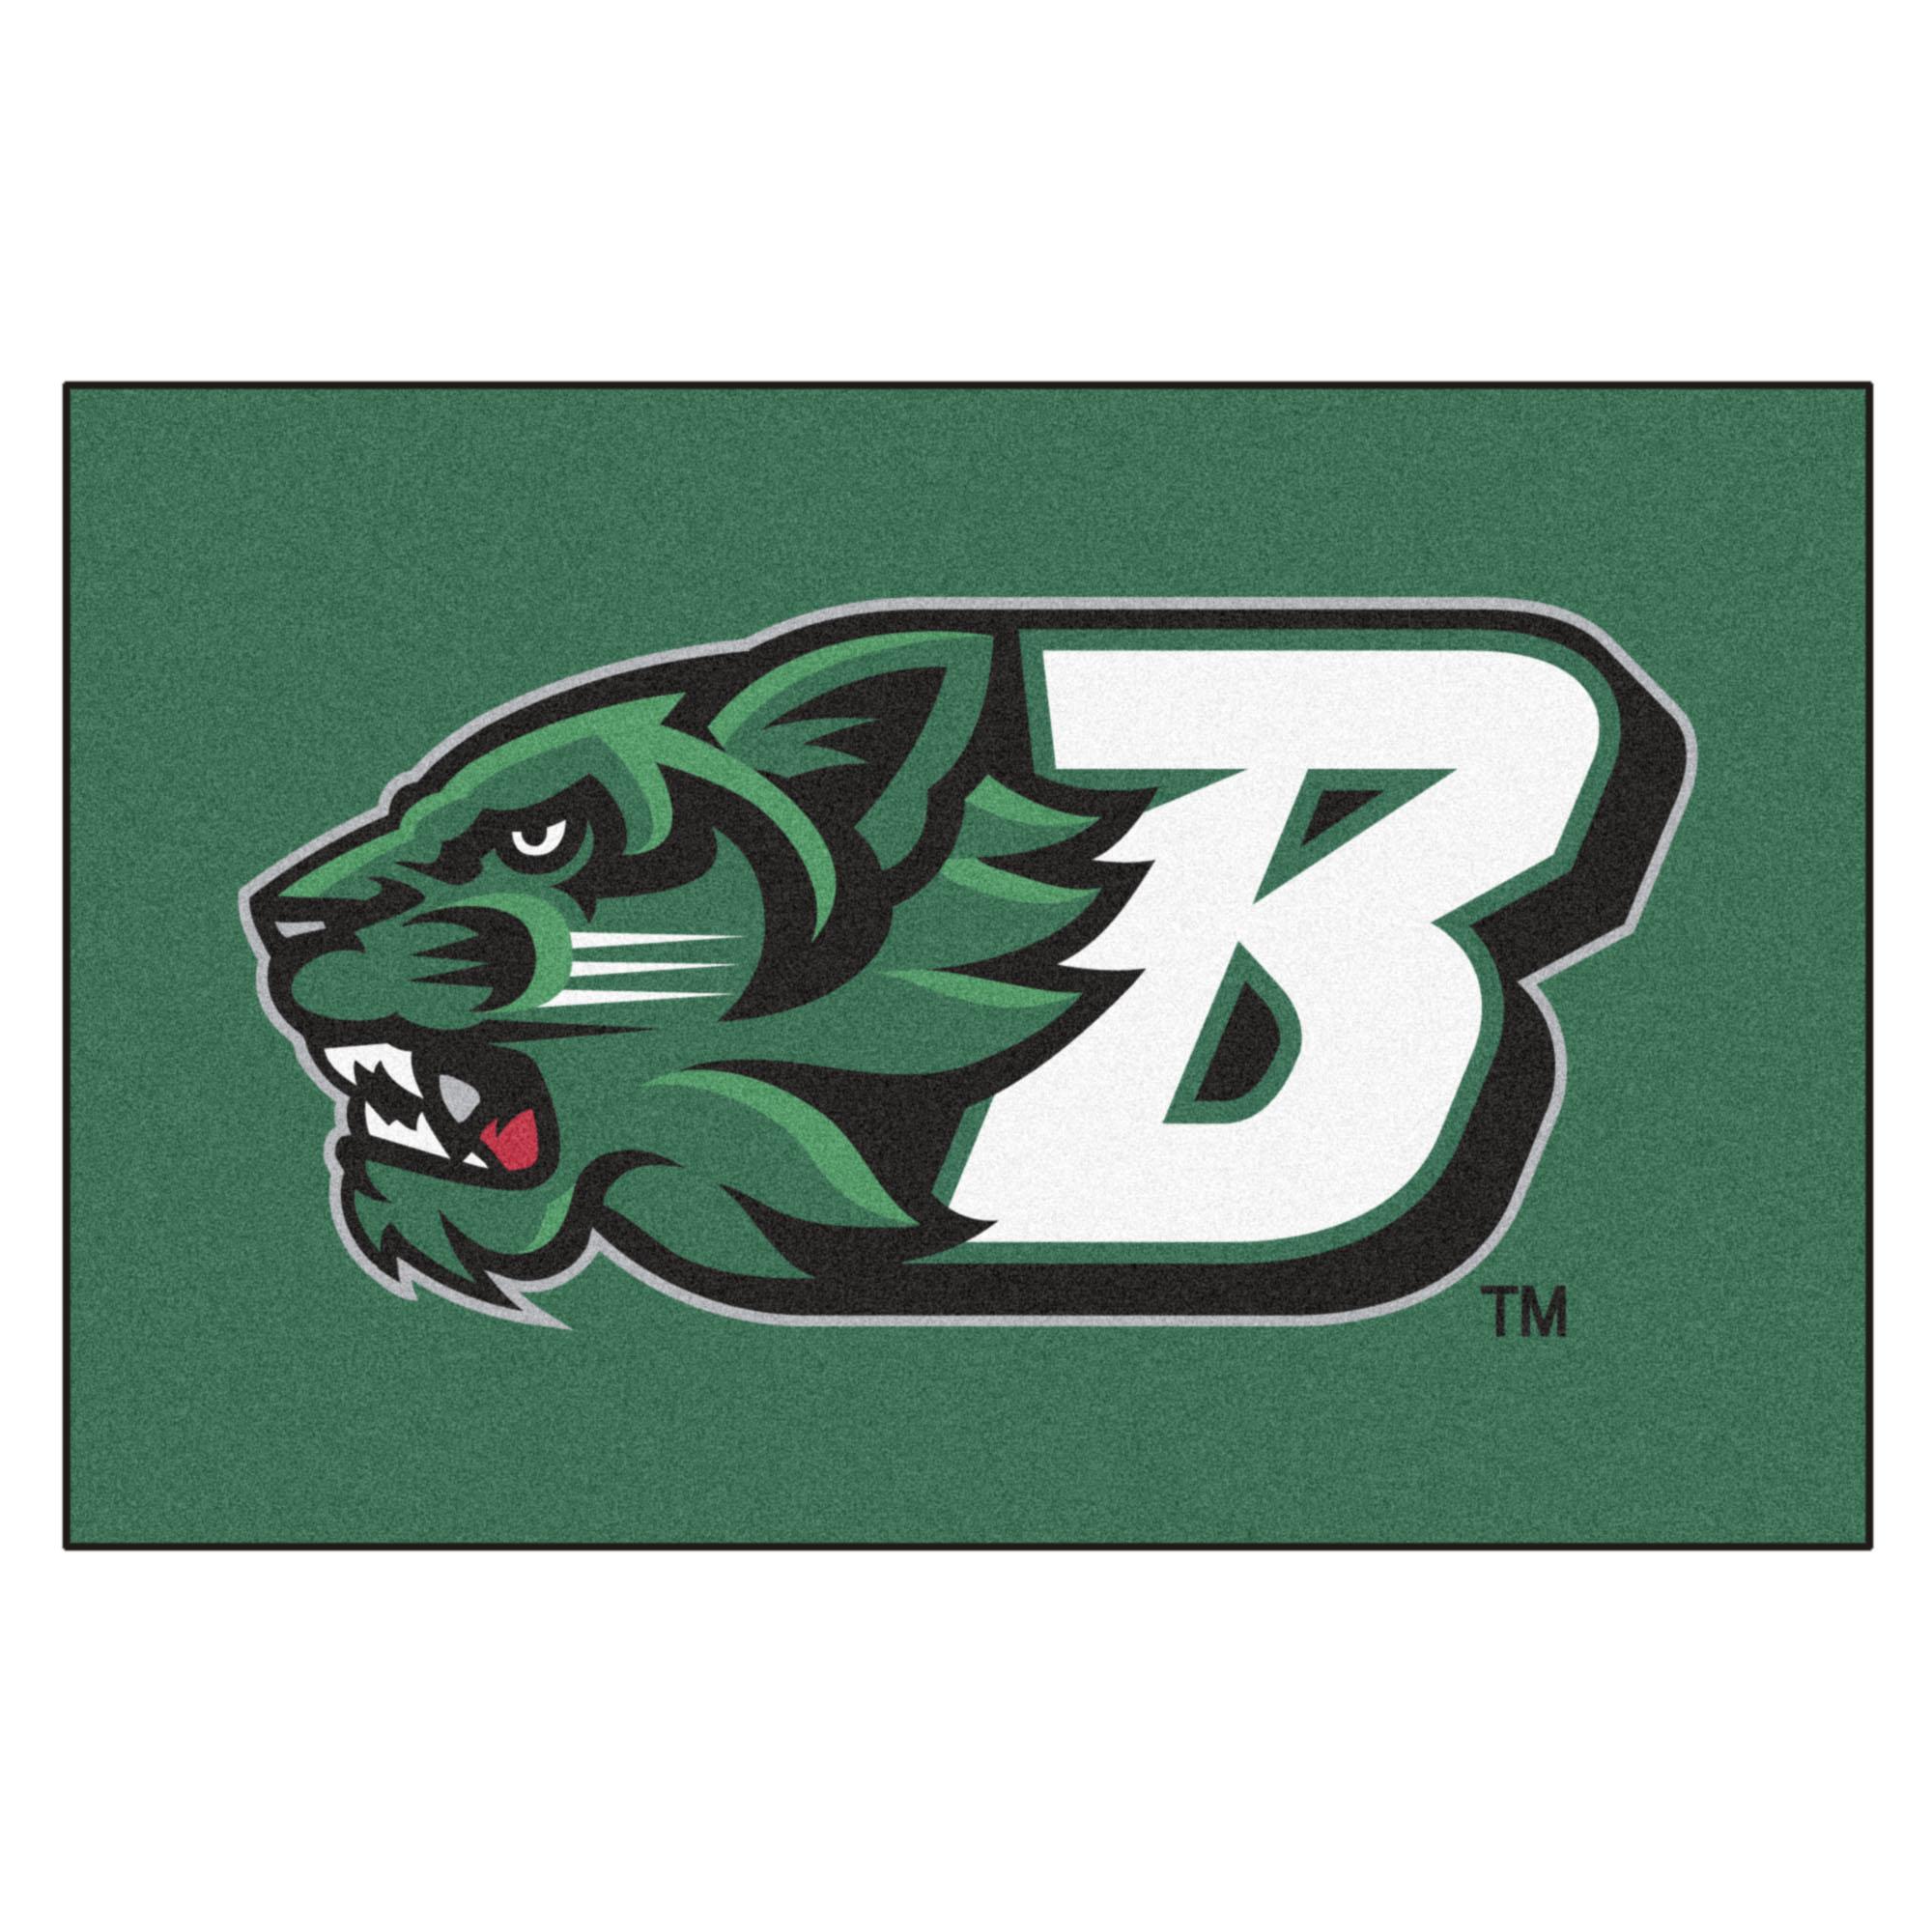 High Resolution Wallpaper | Binghamton University Bearcats 2000x2000 px